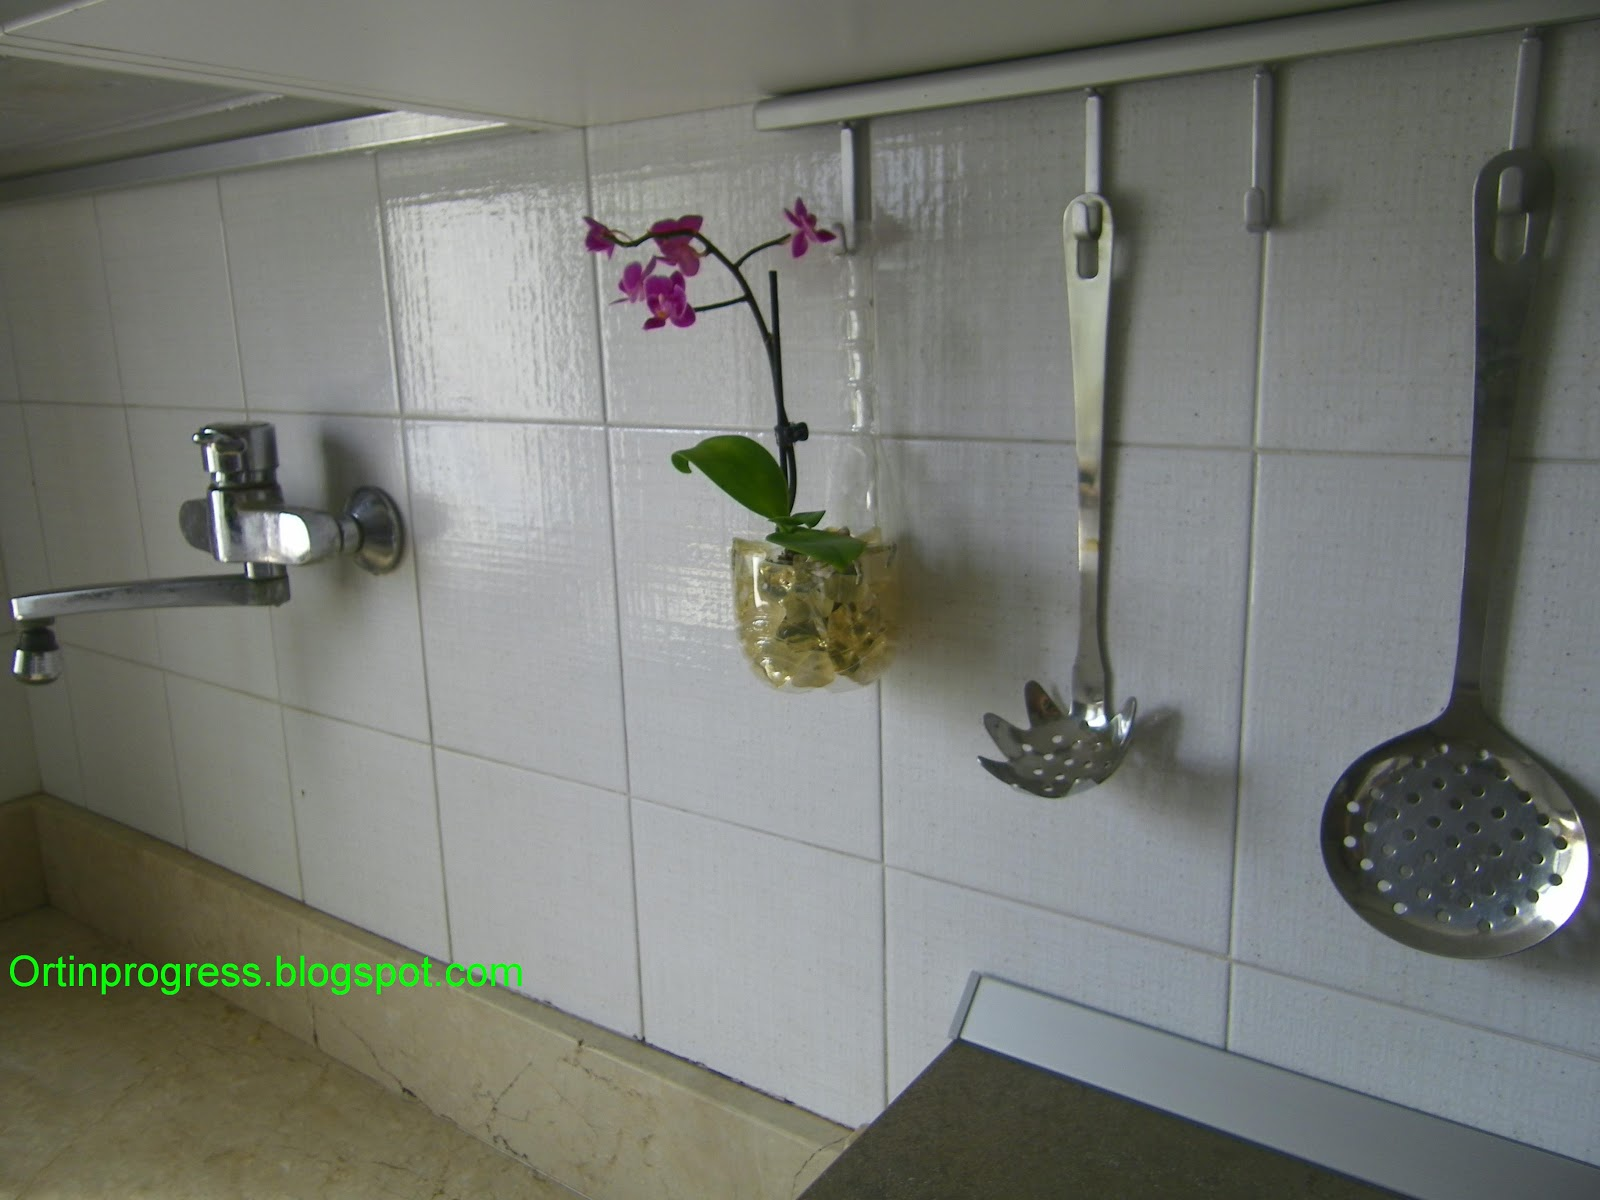 Orti in progress perch tenere l 39 orchidea in cucina - Dove comprare cucina ...